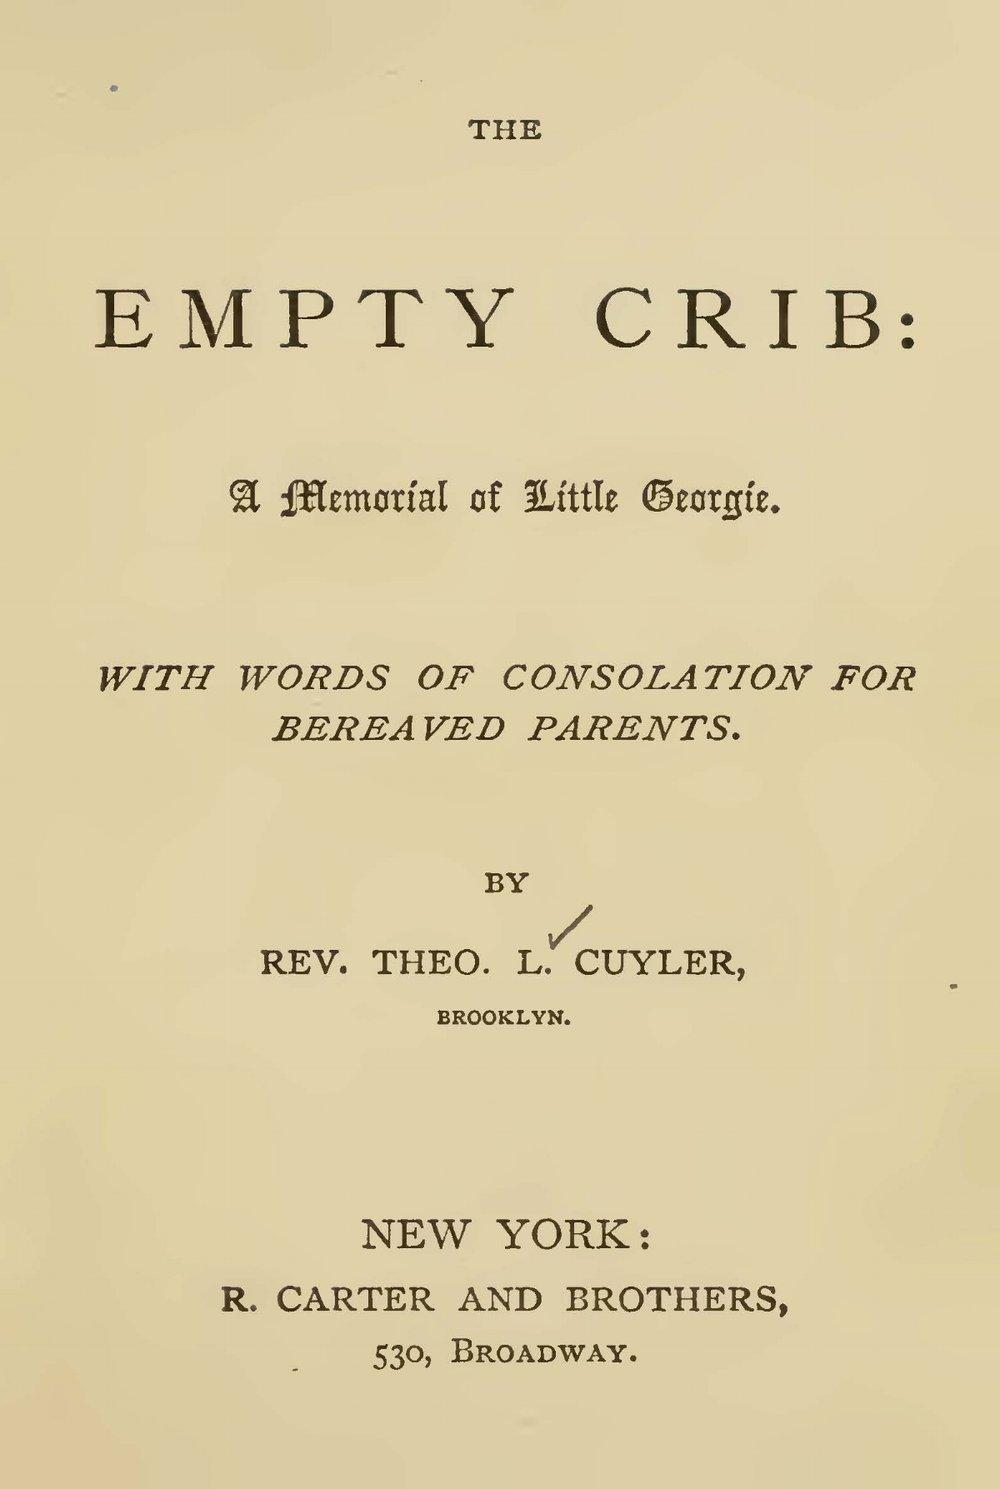 Cuyler, Theodore Ledyard, The Empty Crib Title Page.jpg